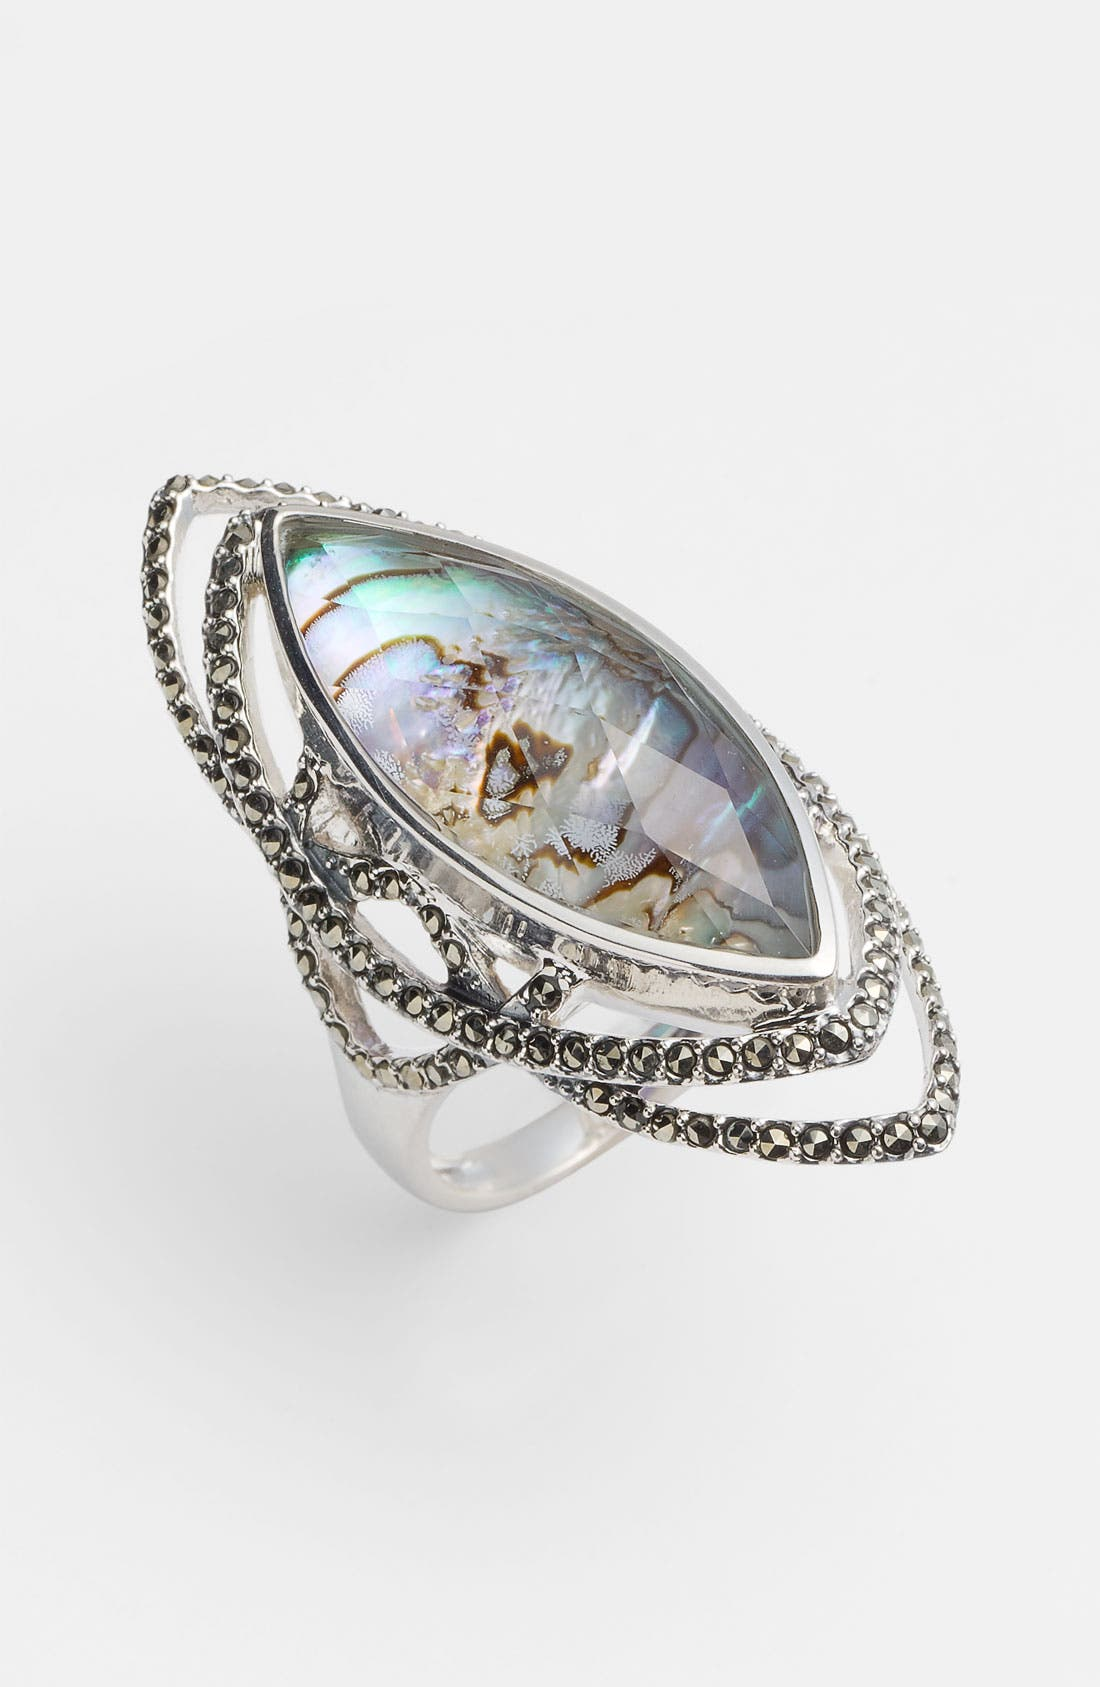 Main Image - Judith Jack Abalone Doublet Ring